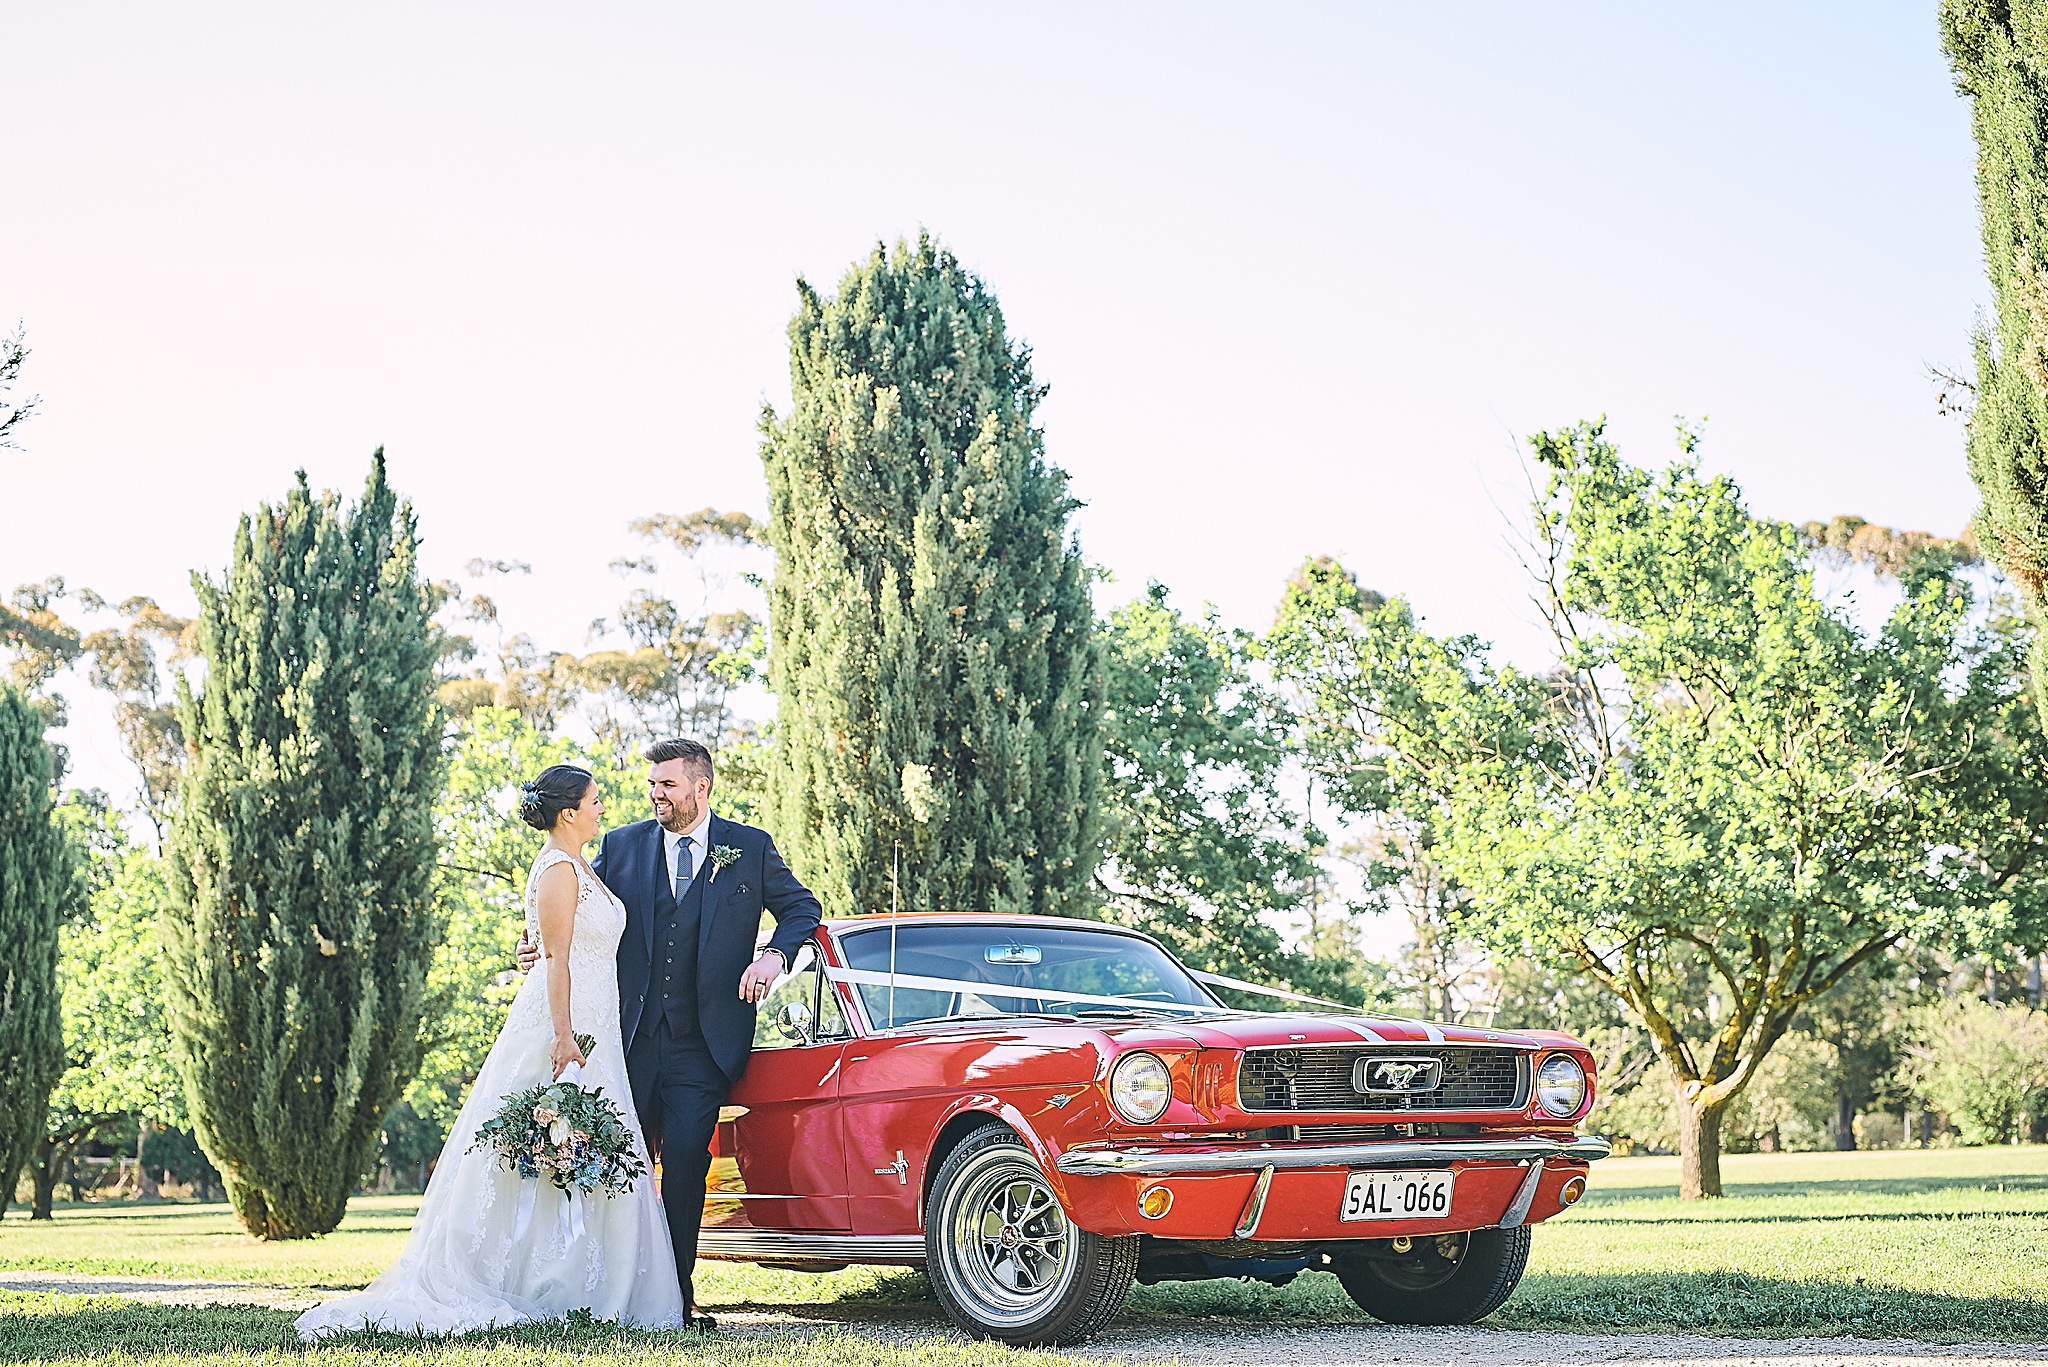 wedding_photographer_adelaide_0030.jpg